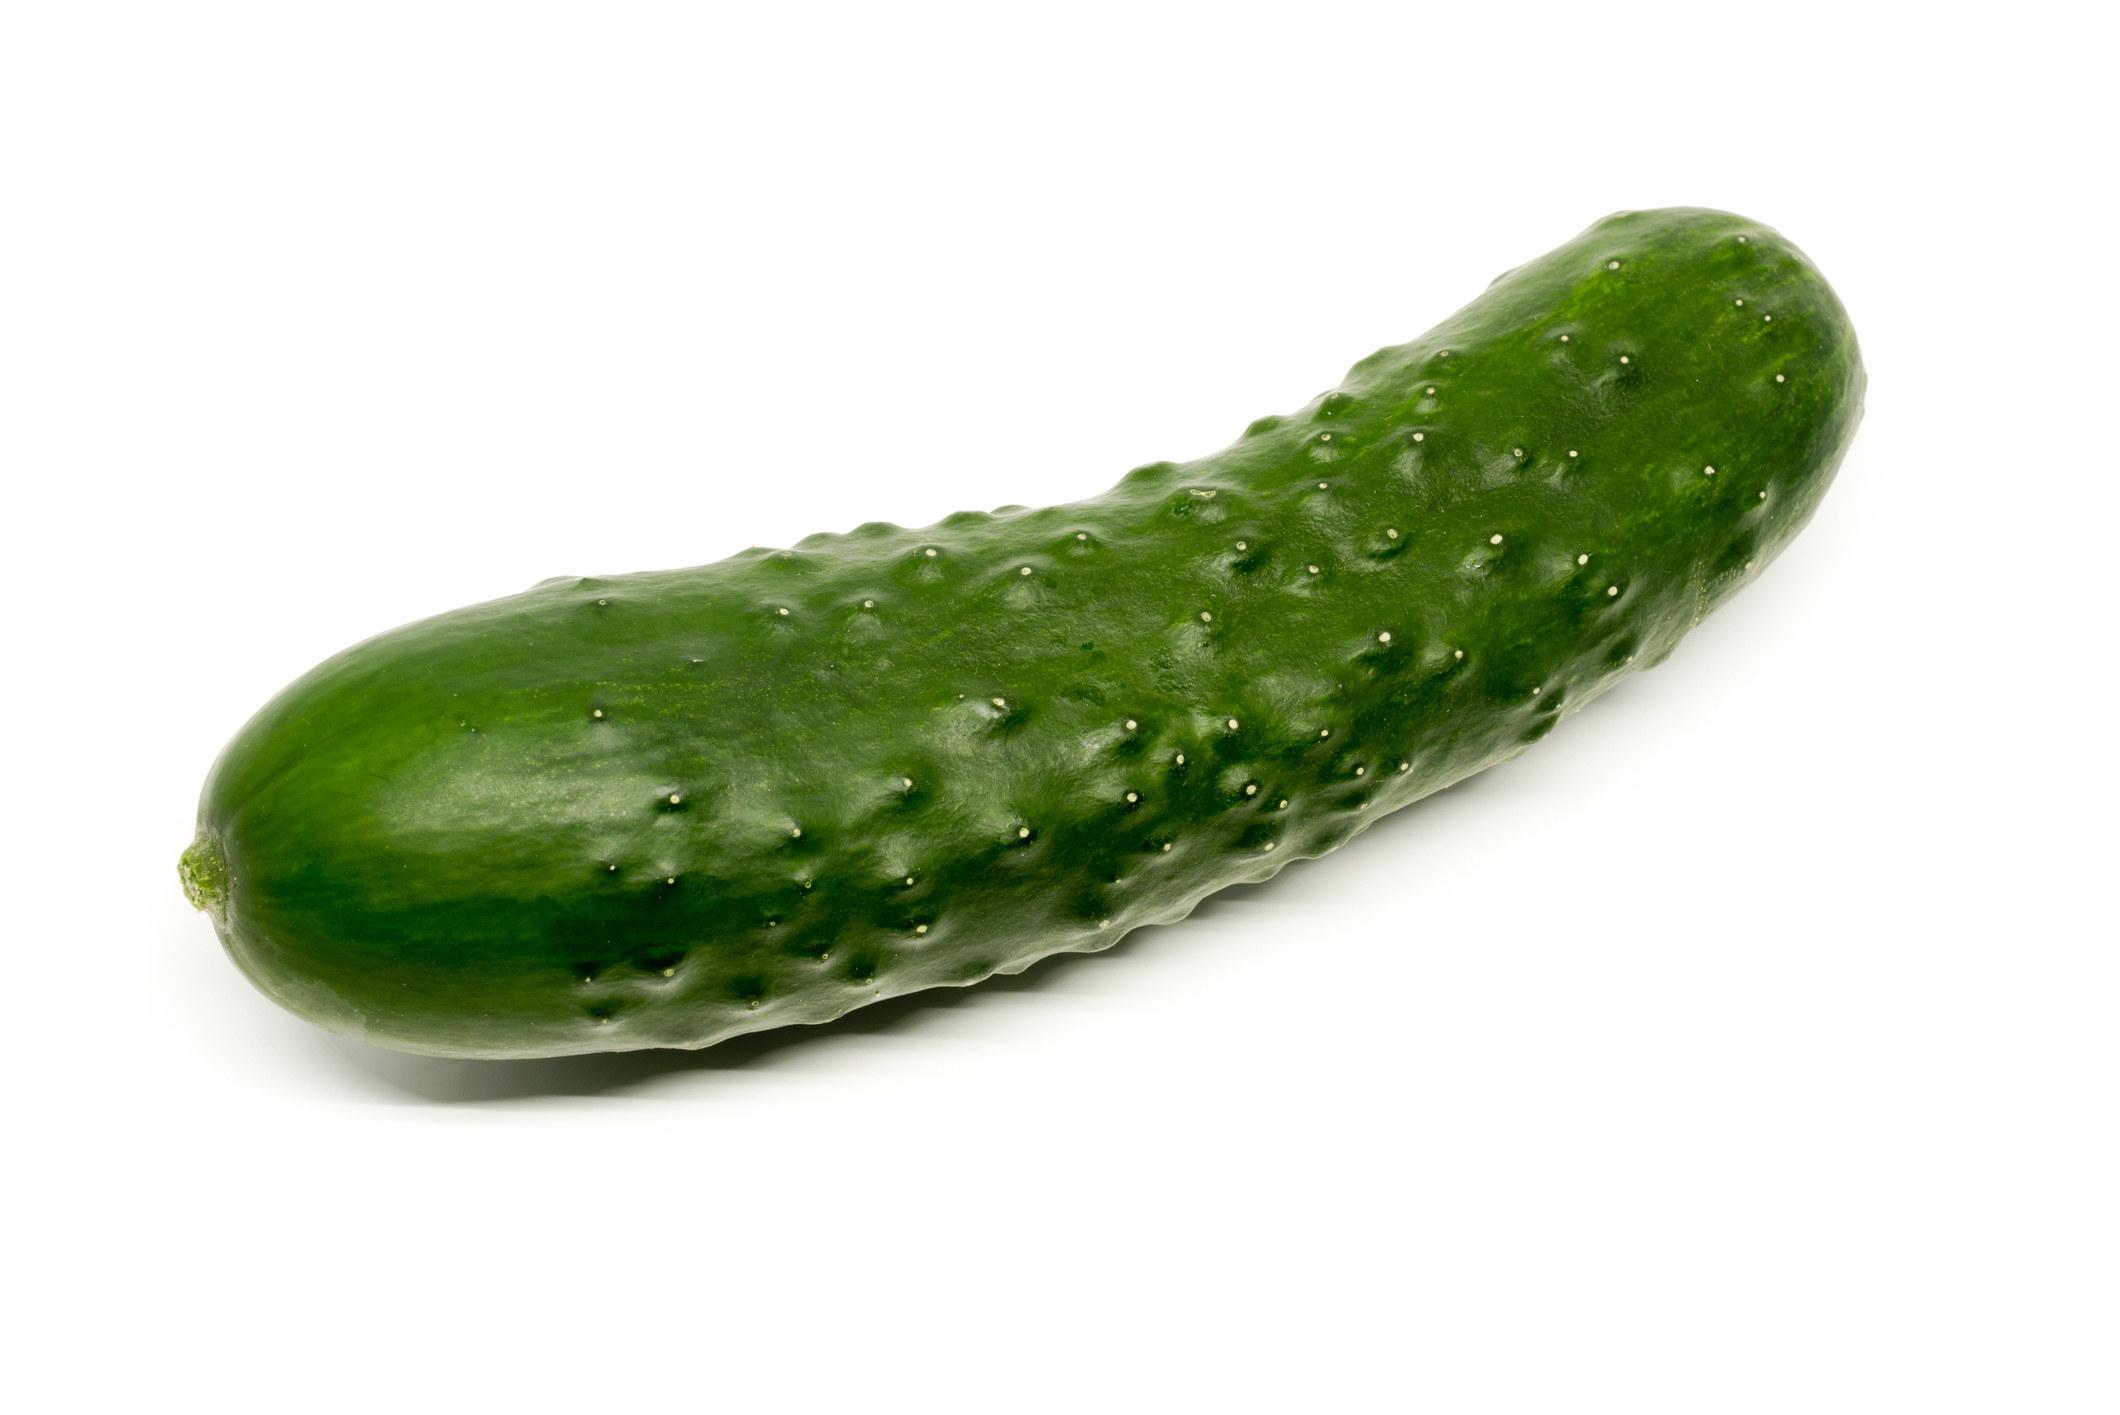 A large cucumber